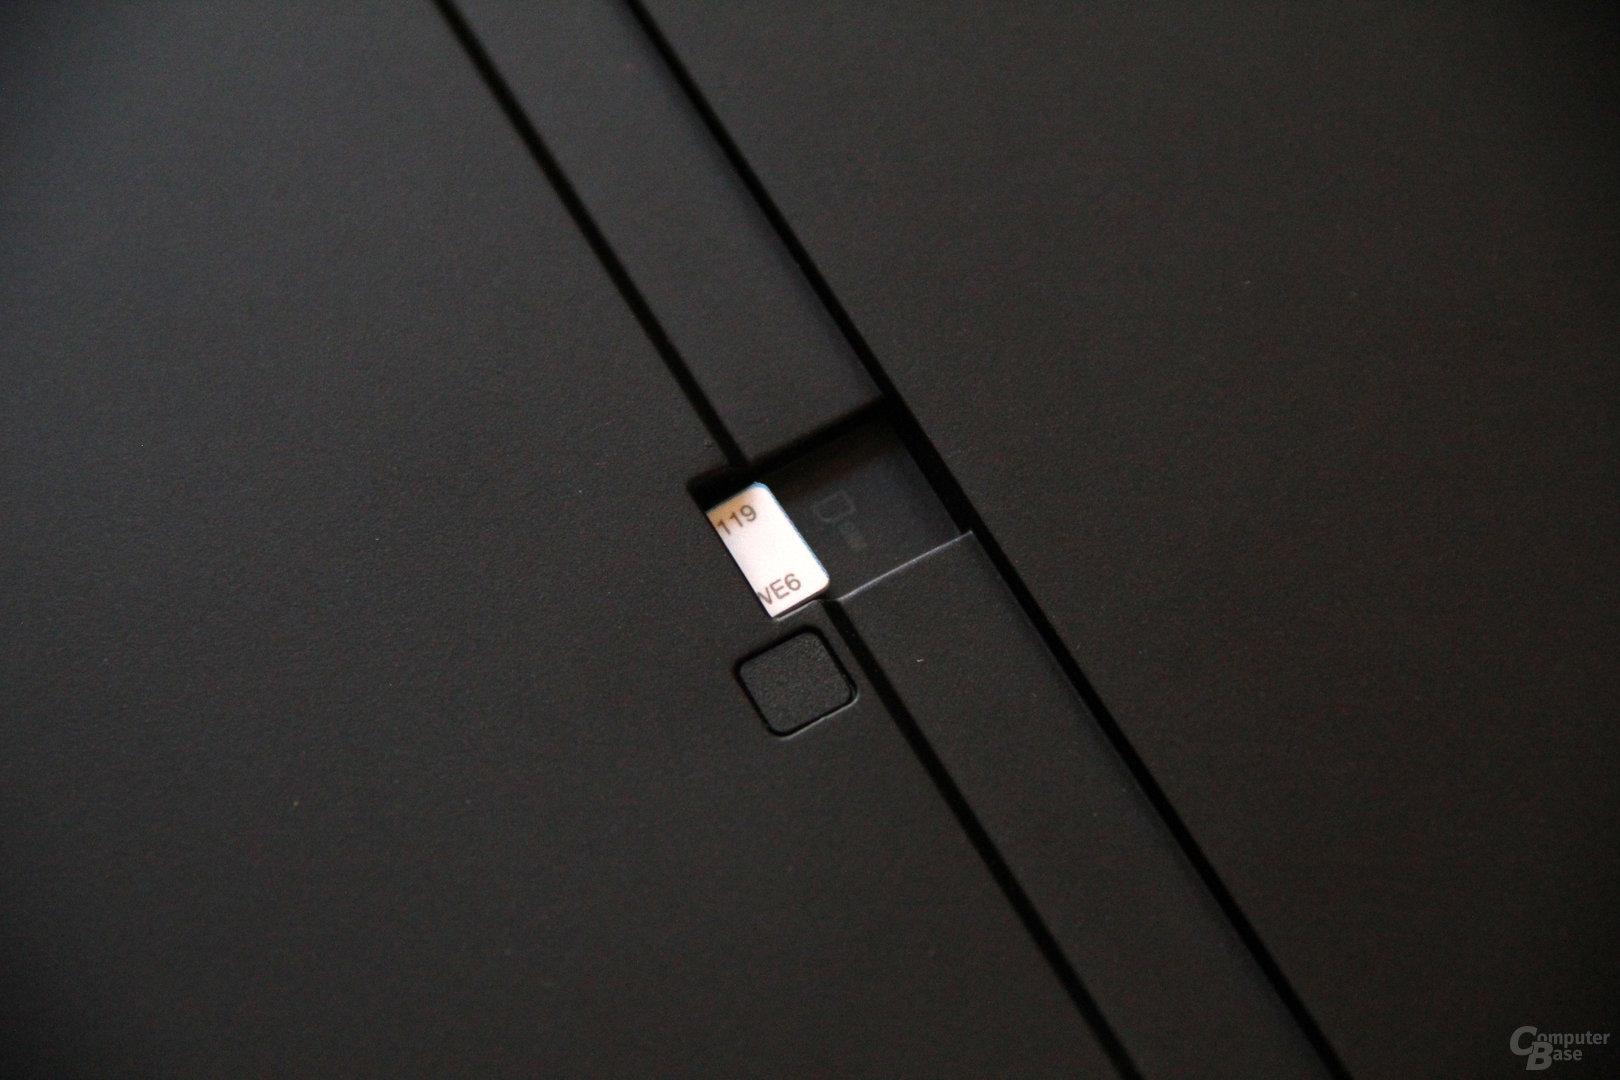 Mobilfunkmodul für Nano-SIMkarten